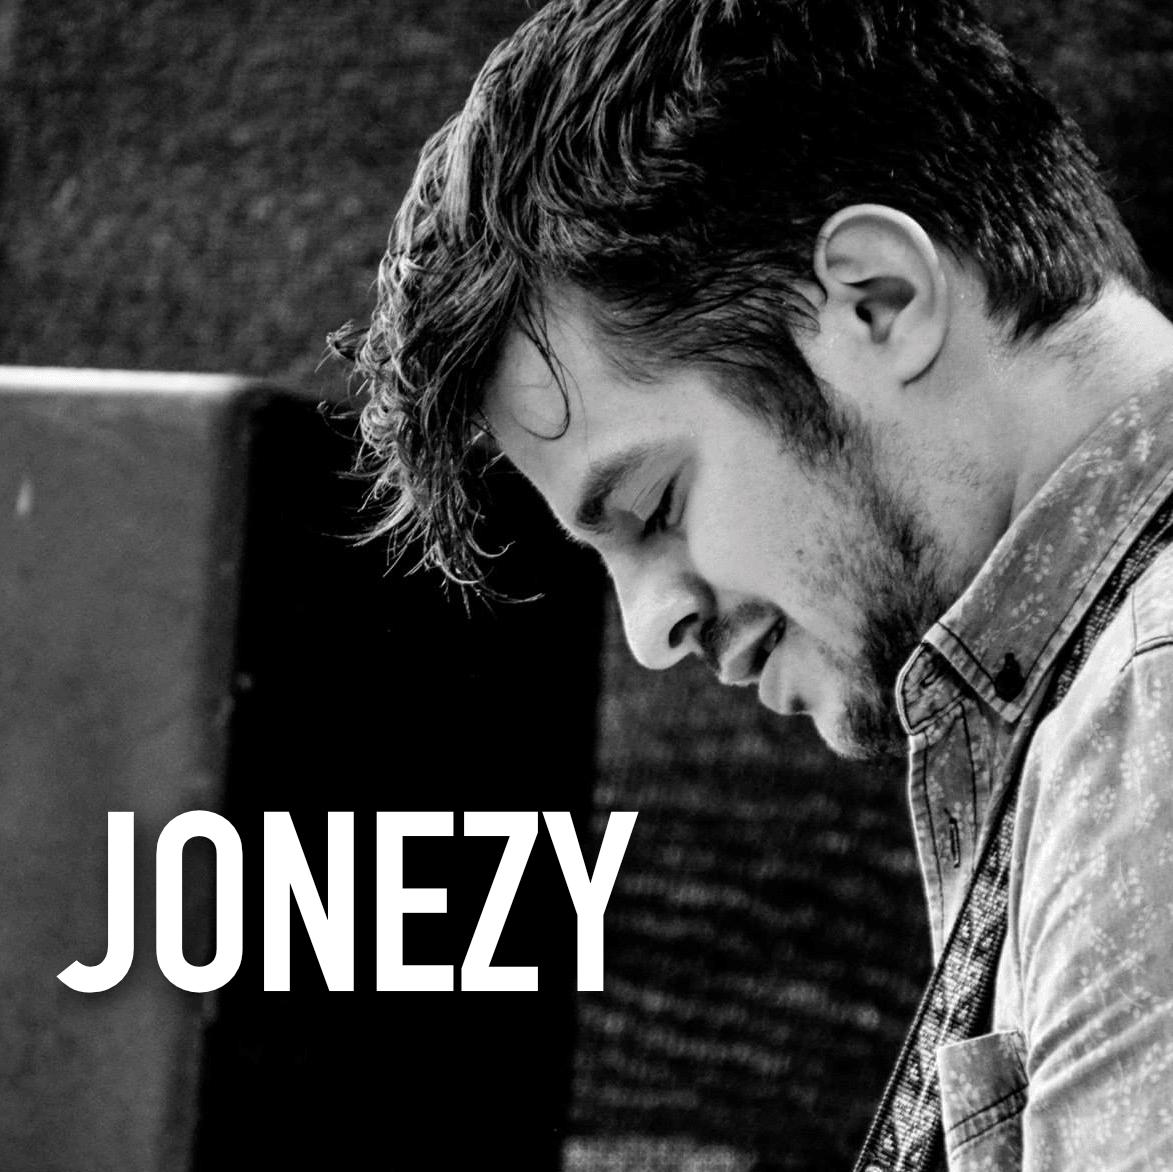 Jonezy